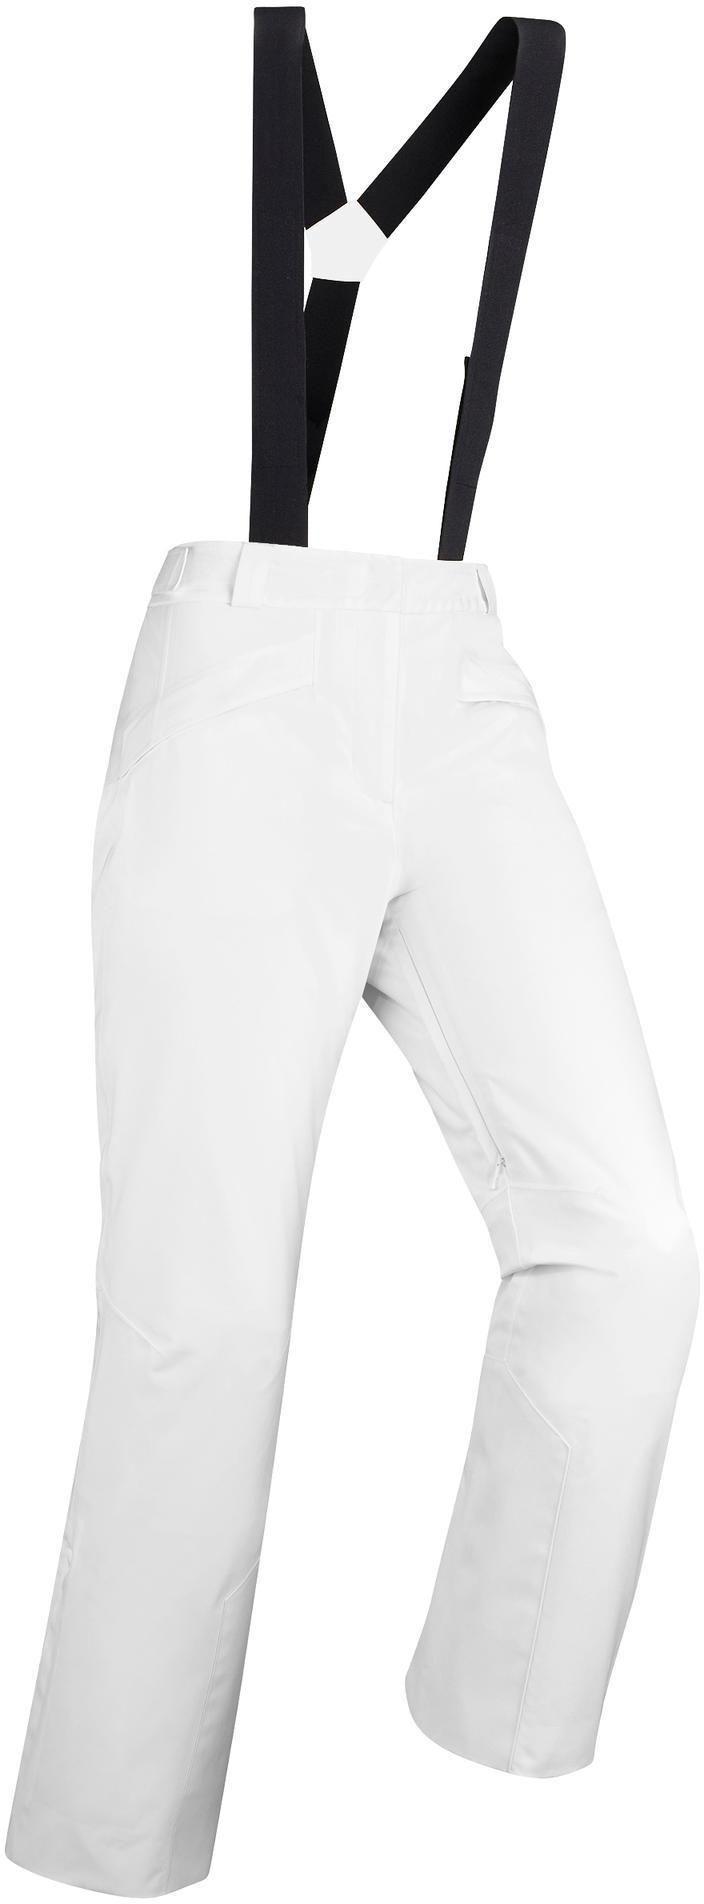 Spodnie narciarskie 580 damskie